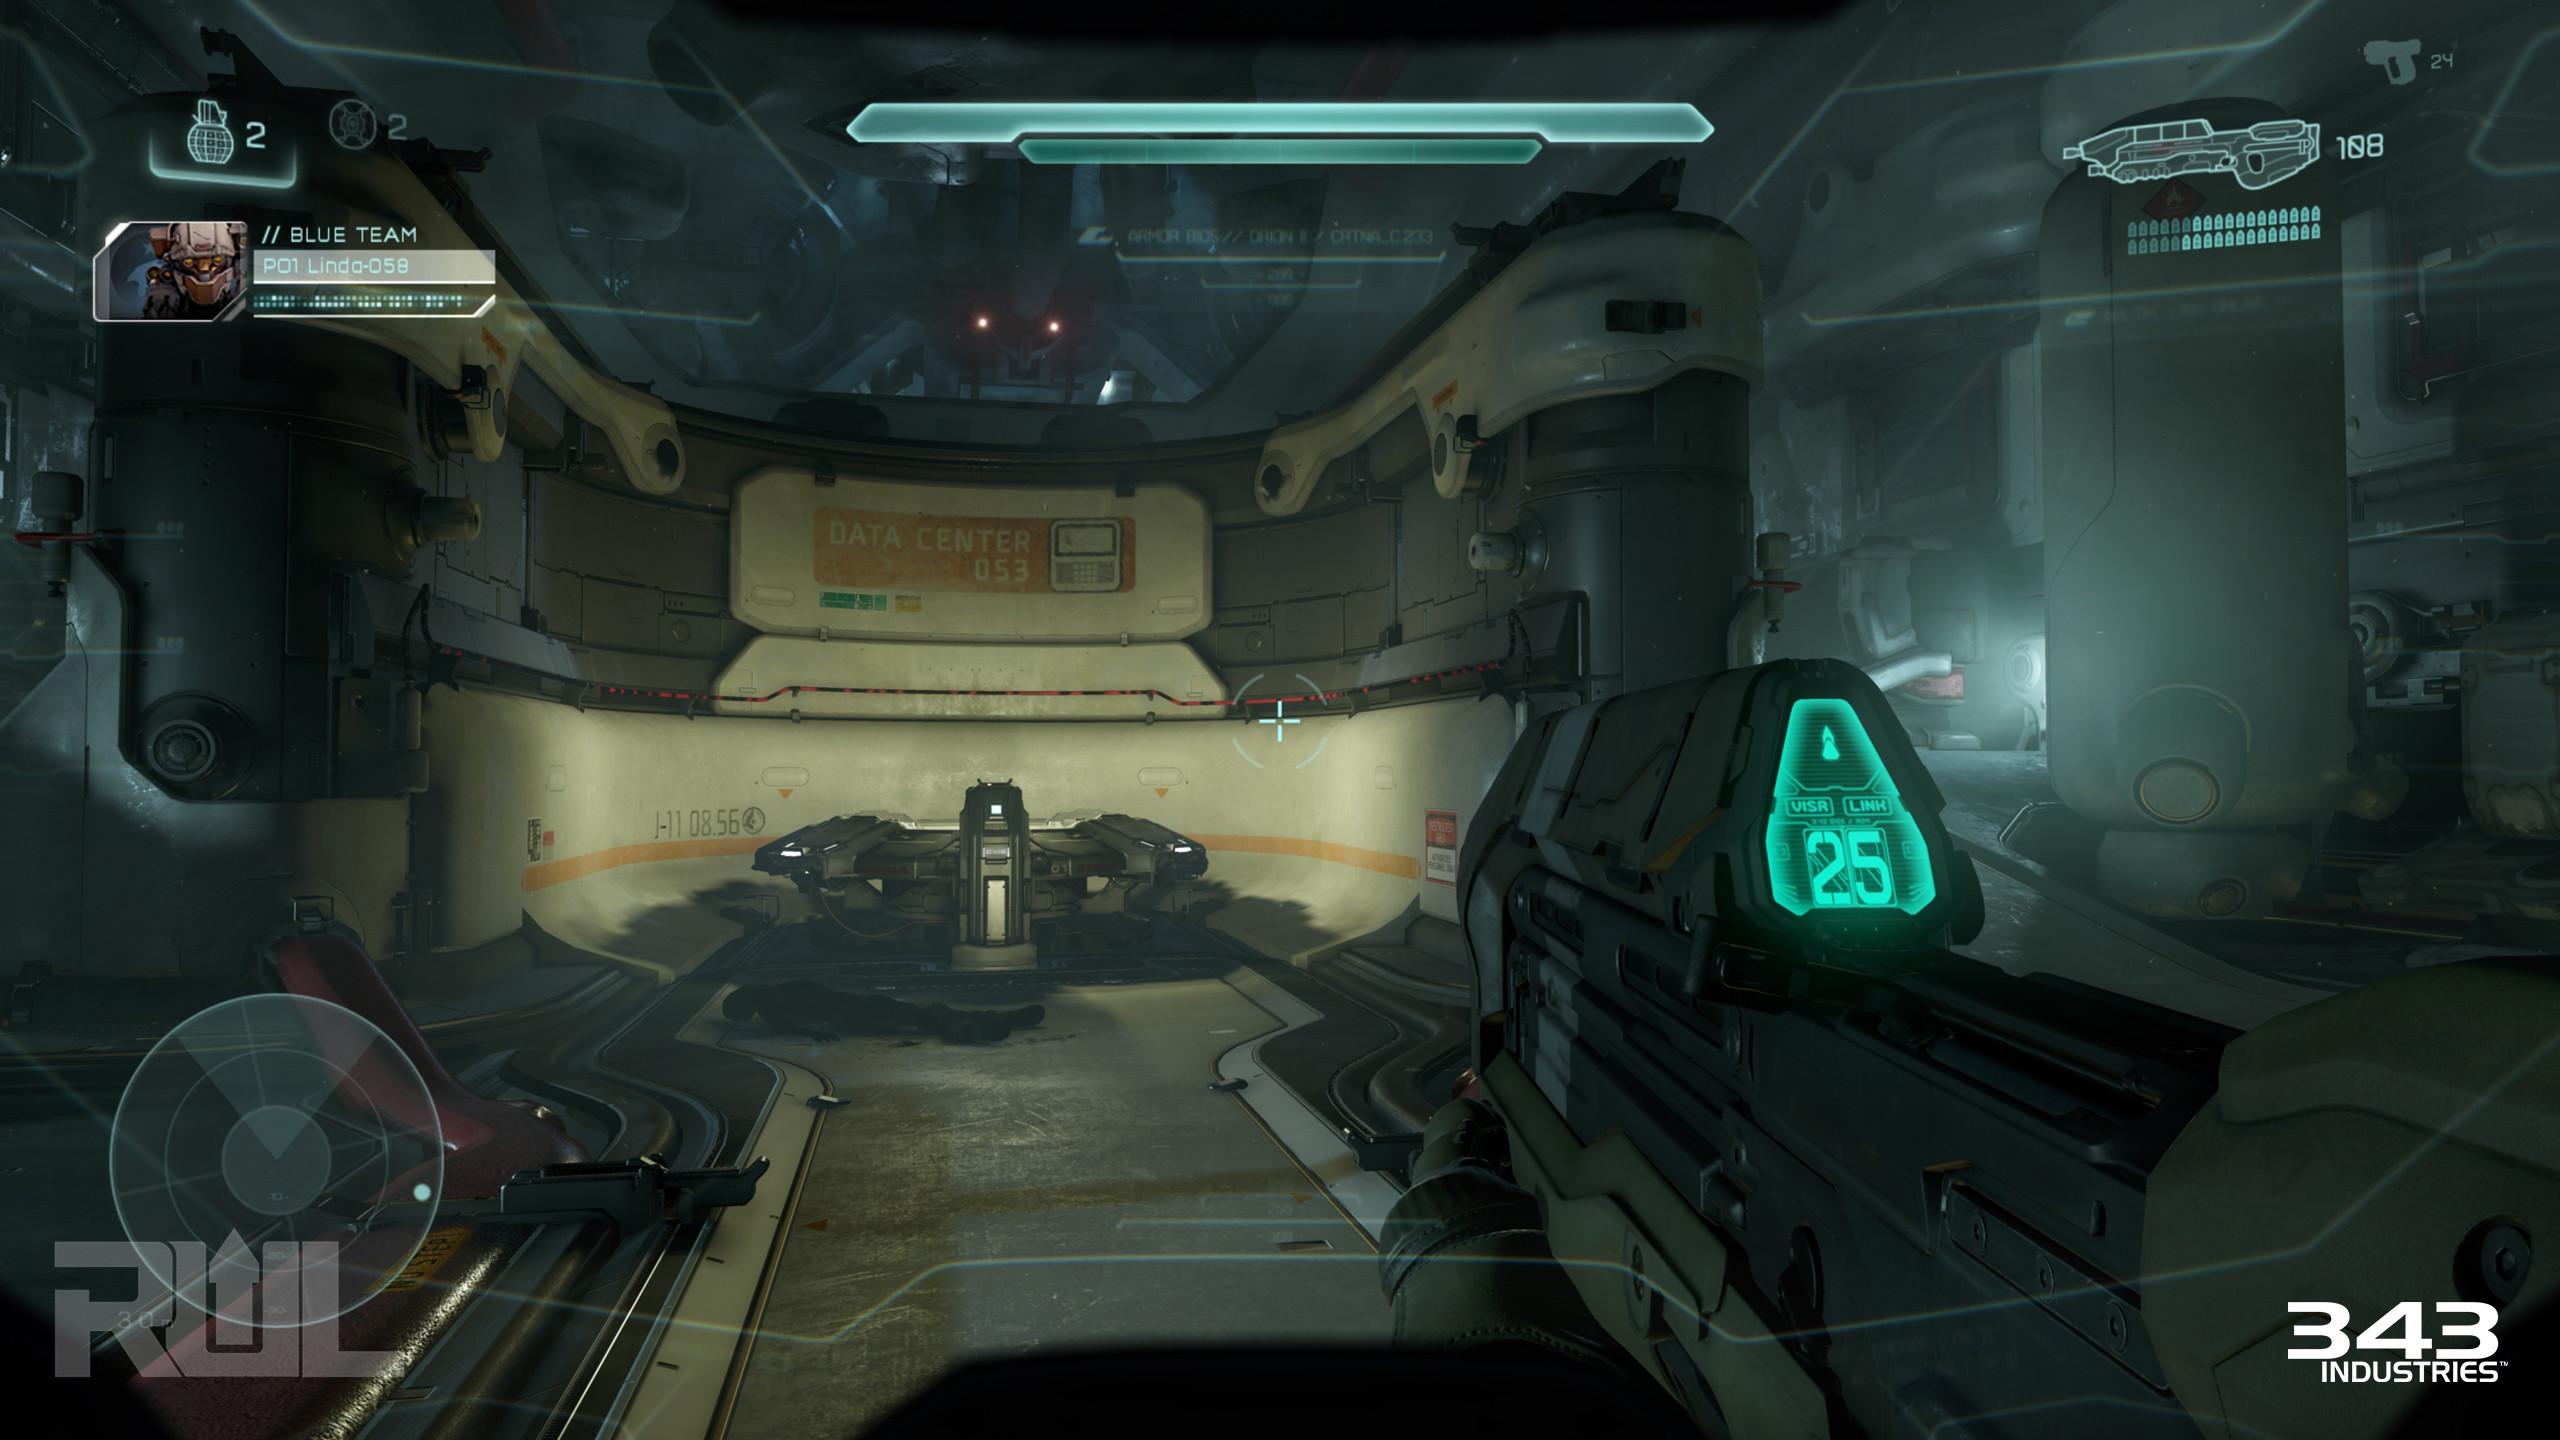 Huge Halo 5 info dump Free DLC and squad controls! – Halo 5: Guardians –  Giant Bomb